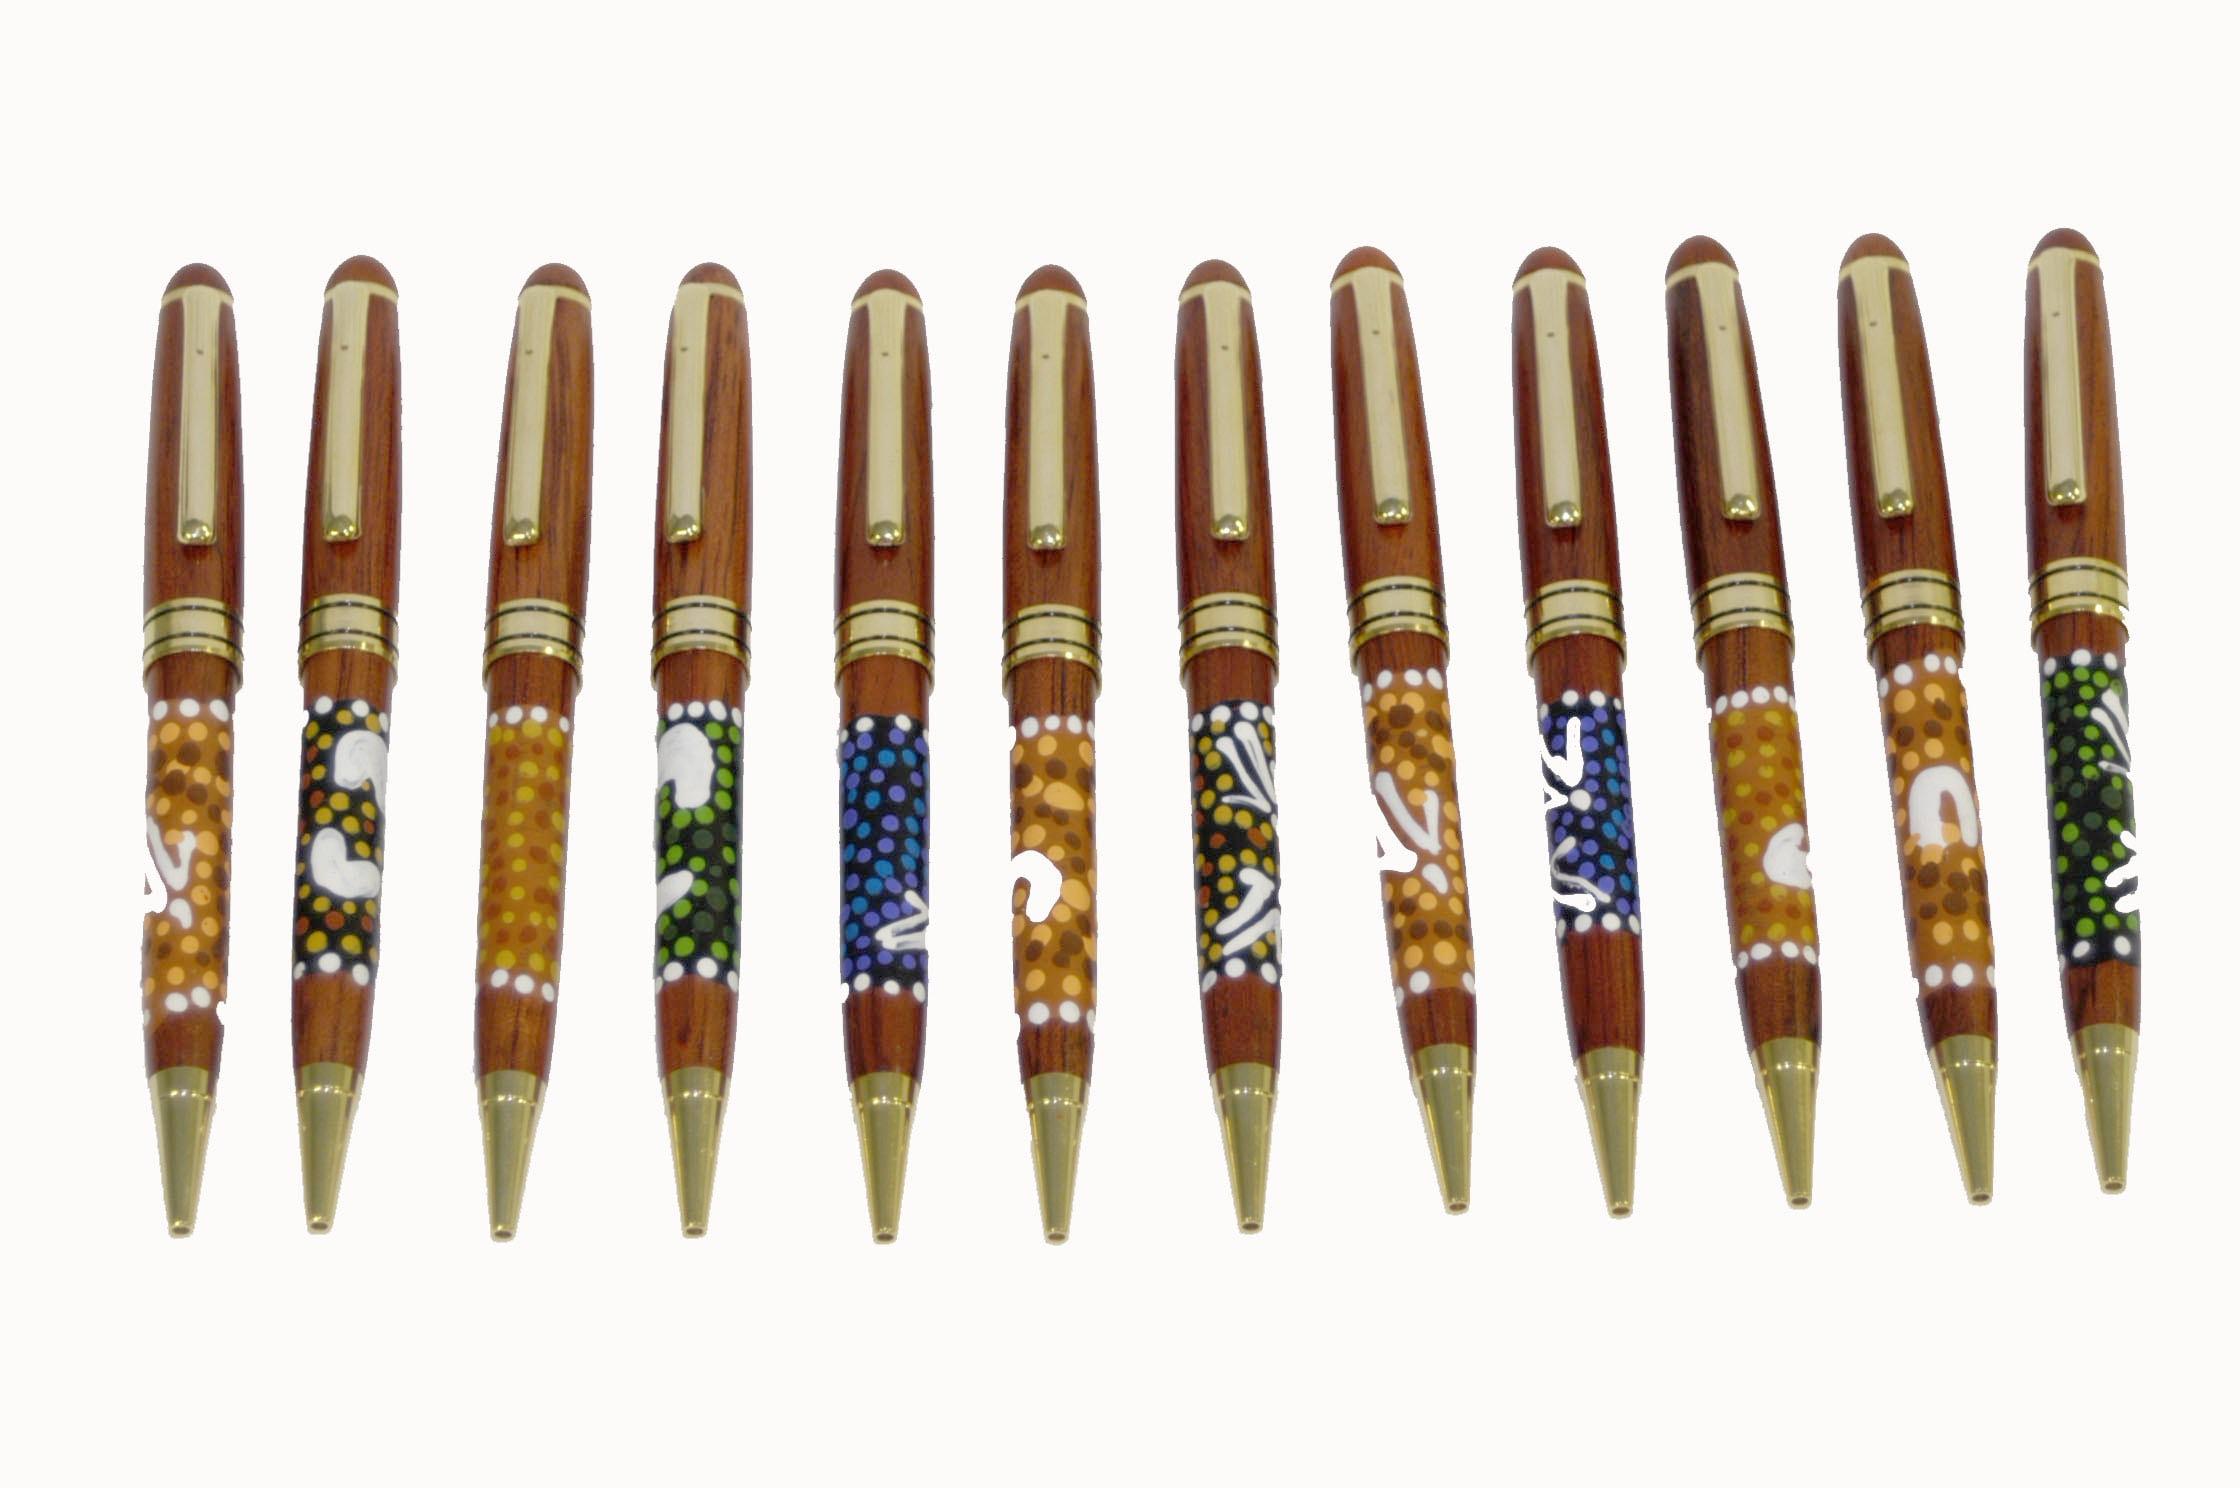 Timber Pen Aboriginal Dot Design Australian Corporate Gifts